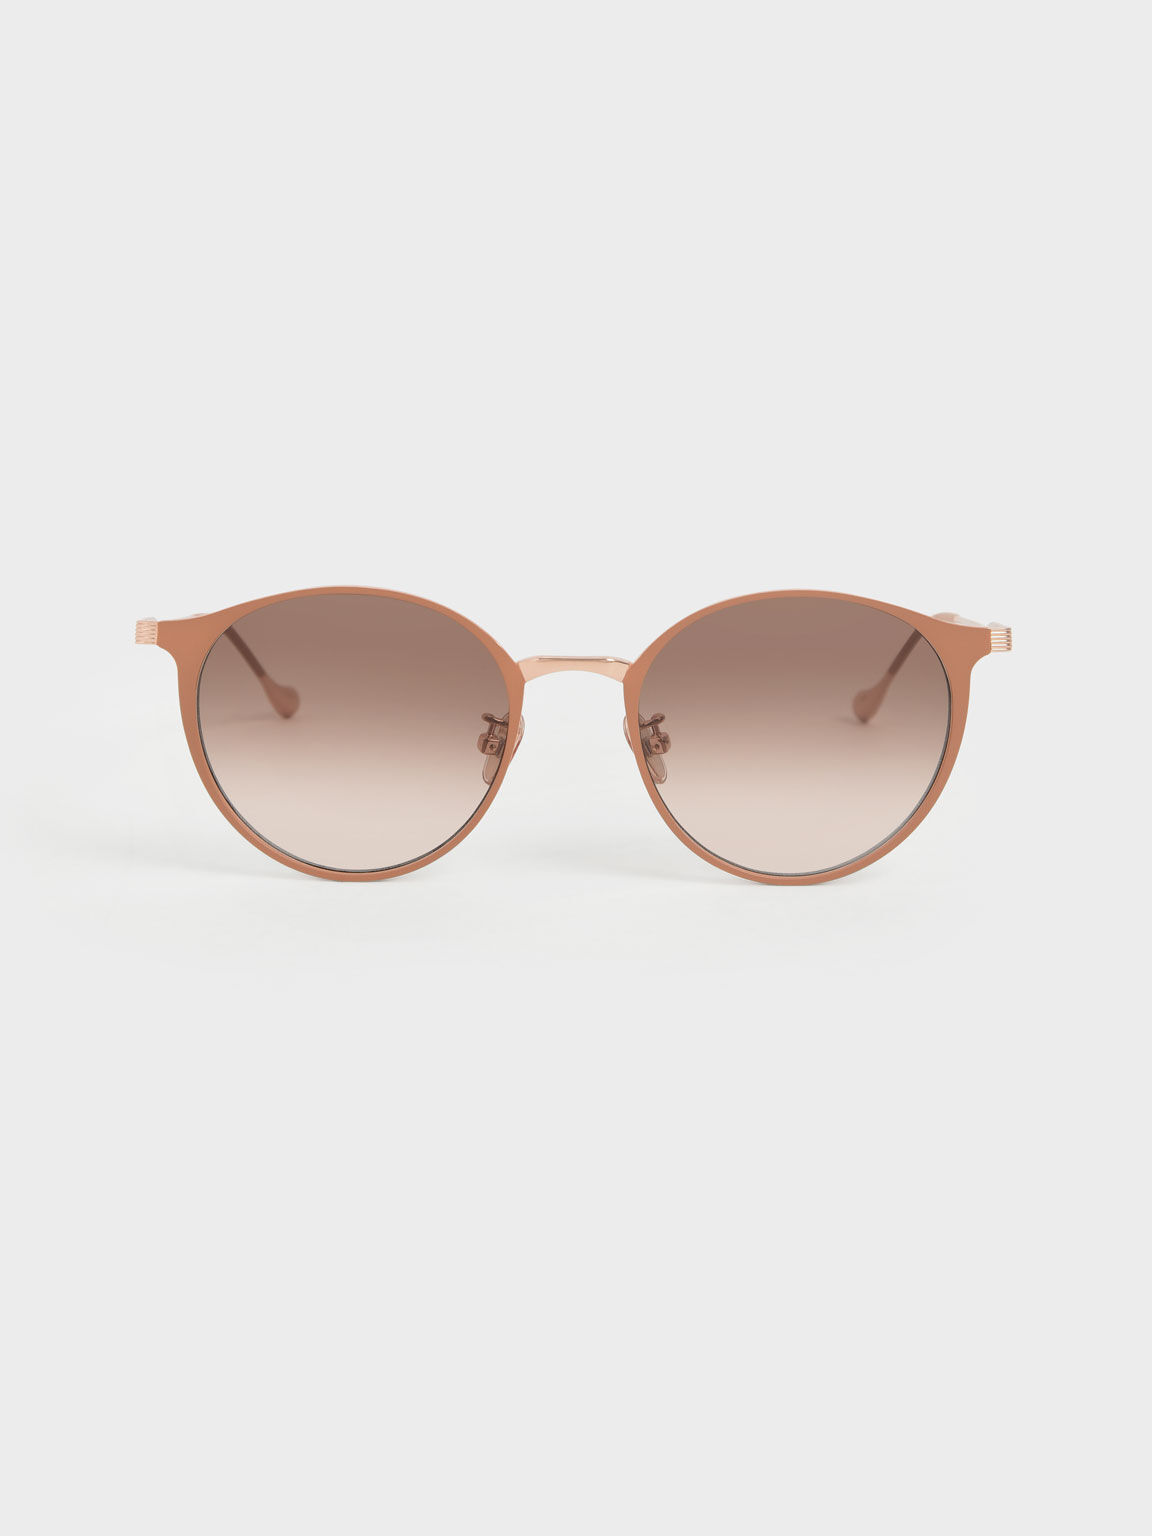 Tinted Round Sunglasses, Pink, hi-res